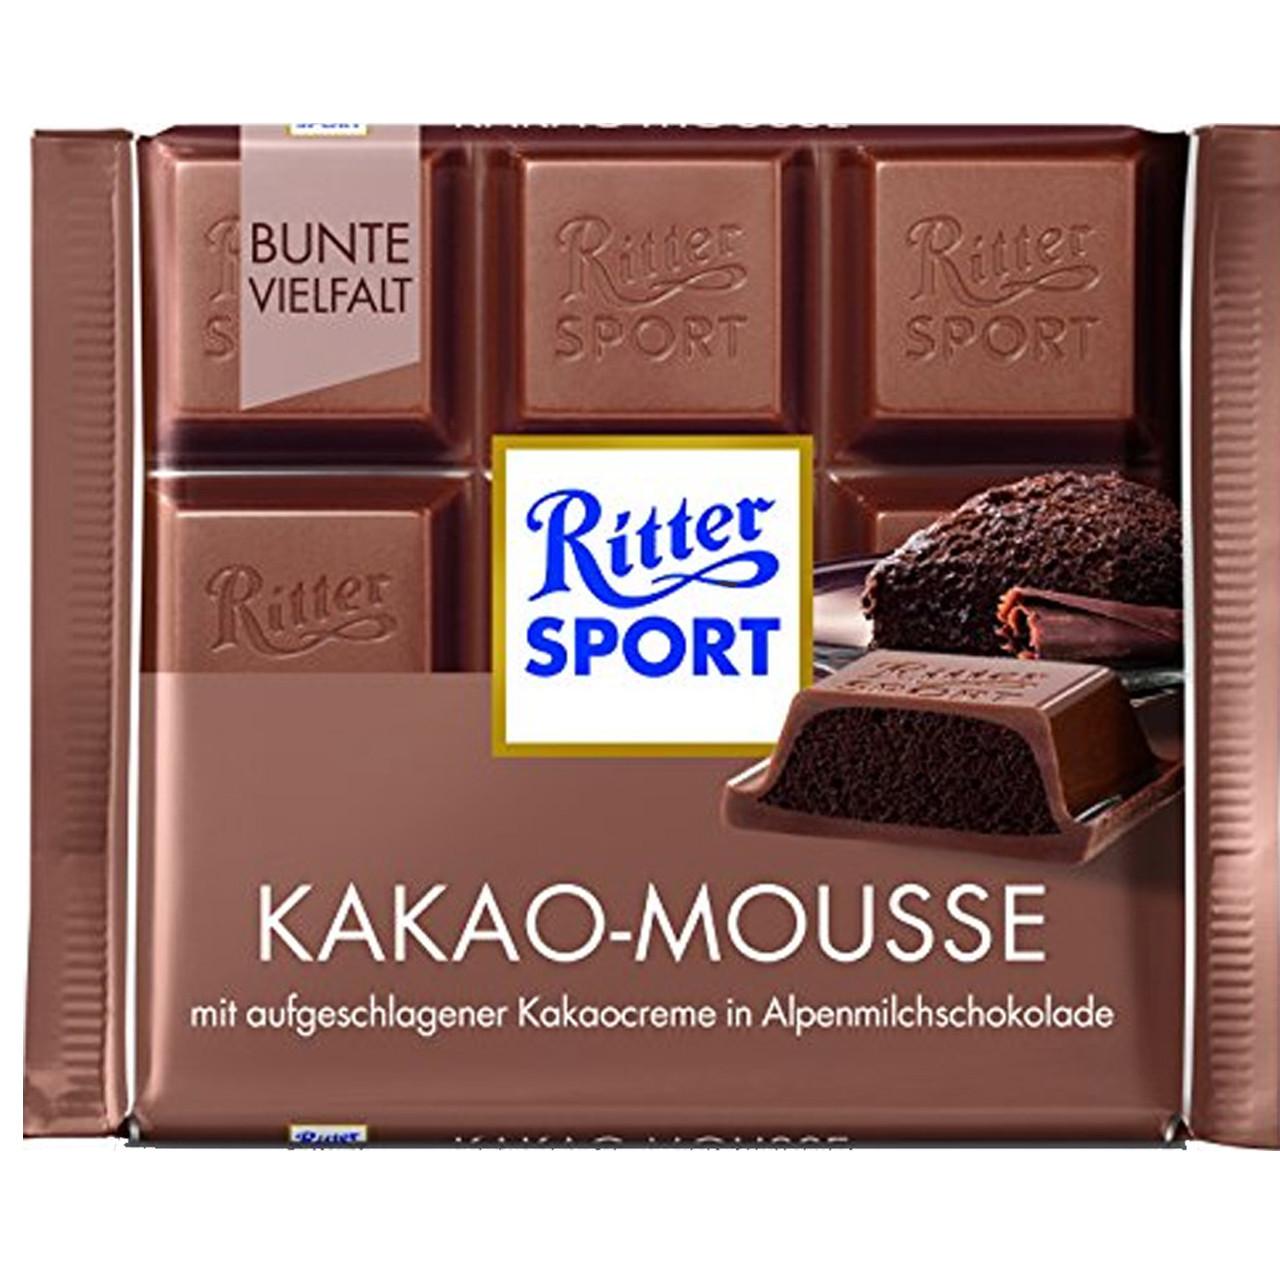 Шоколад Ritter Sport Kakao-Mousse Какао-мусс 100г (1уп/11шт)